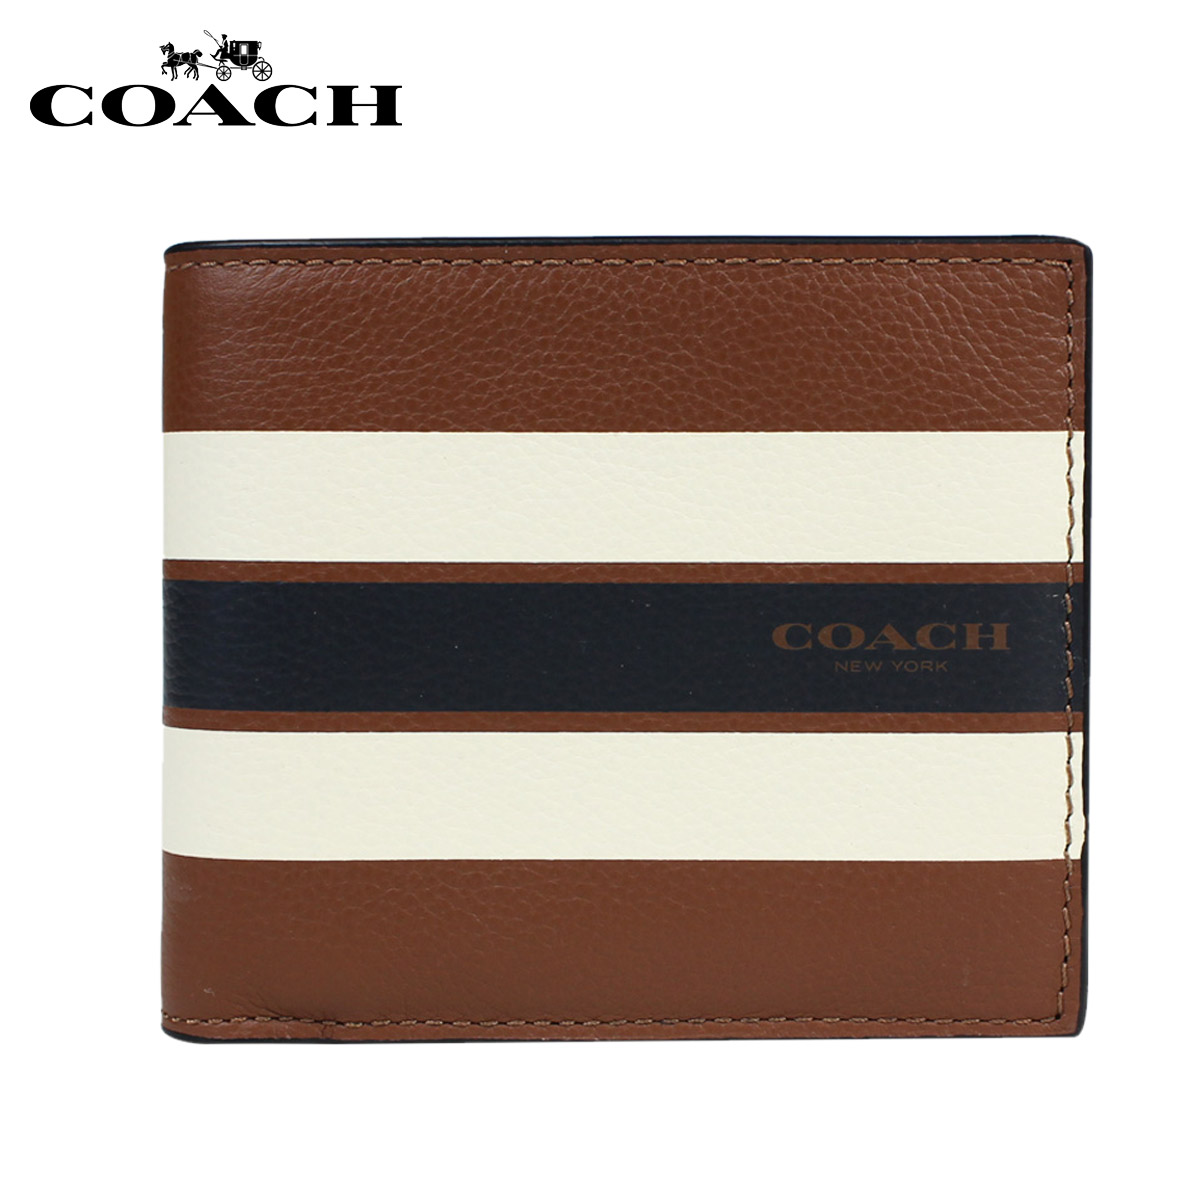 c43fe38a3c COACH coach men wallet folio wallet ID case F75399 dark saddle